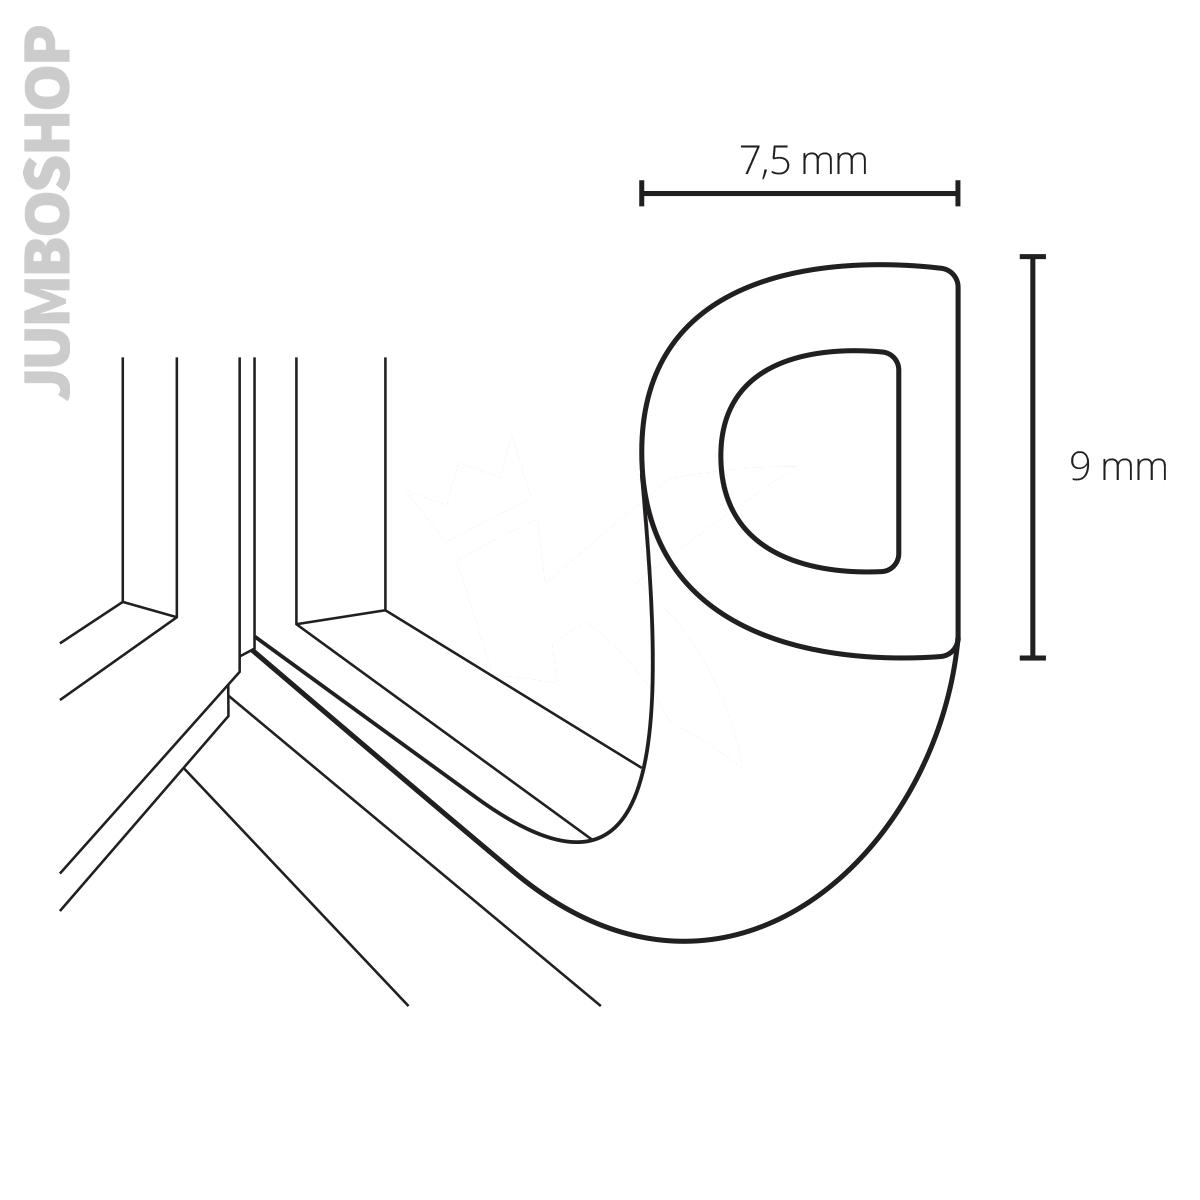 gummidichtung fensterdichtung t rdichtung selbstklebend gummi profil dichtung. Black Bedroom Furniture Sets. Home Design Ideas